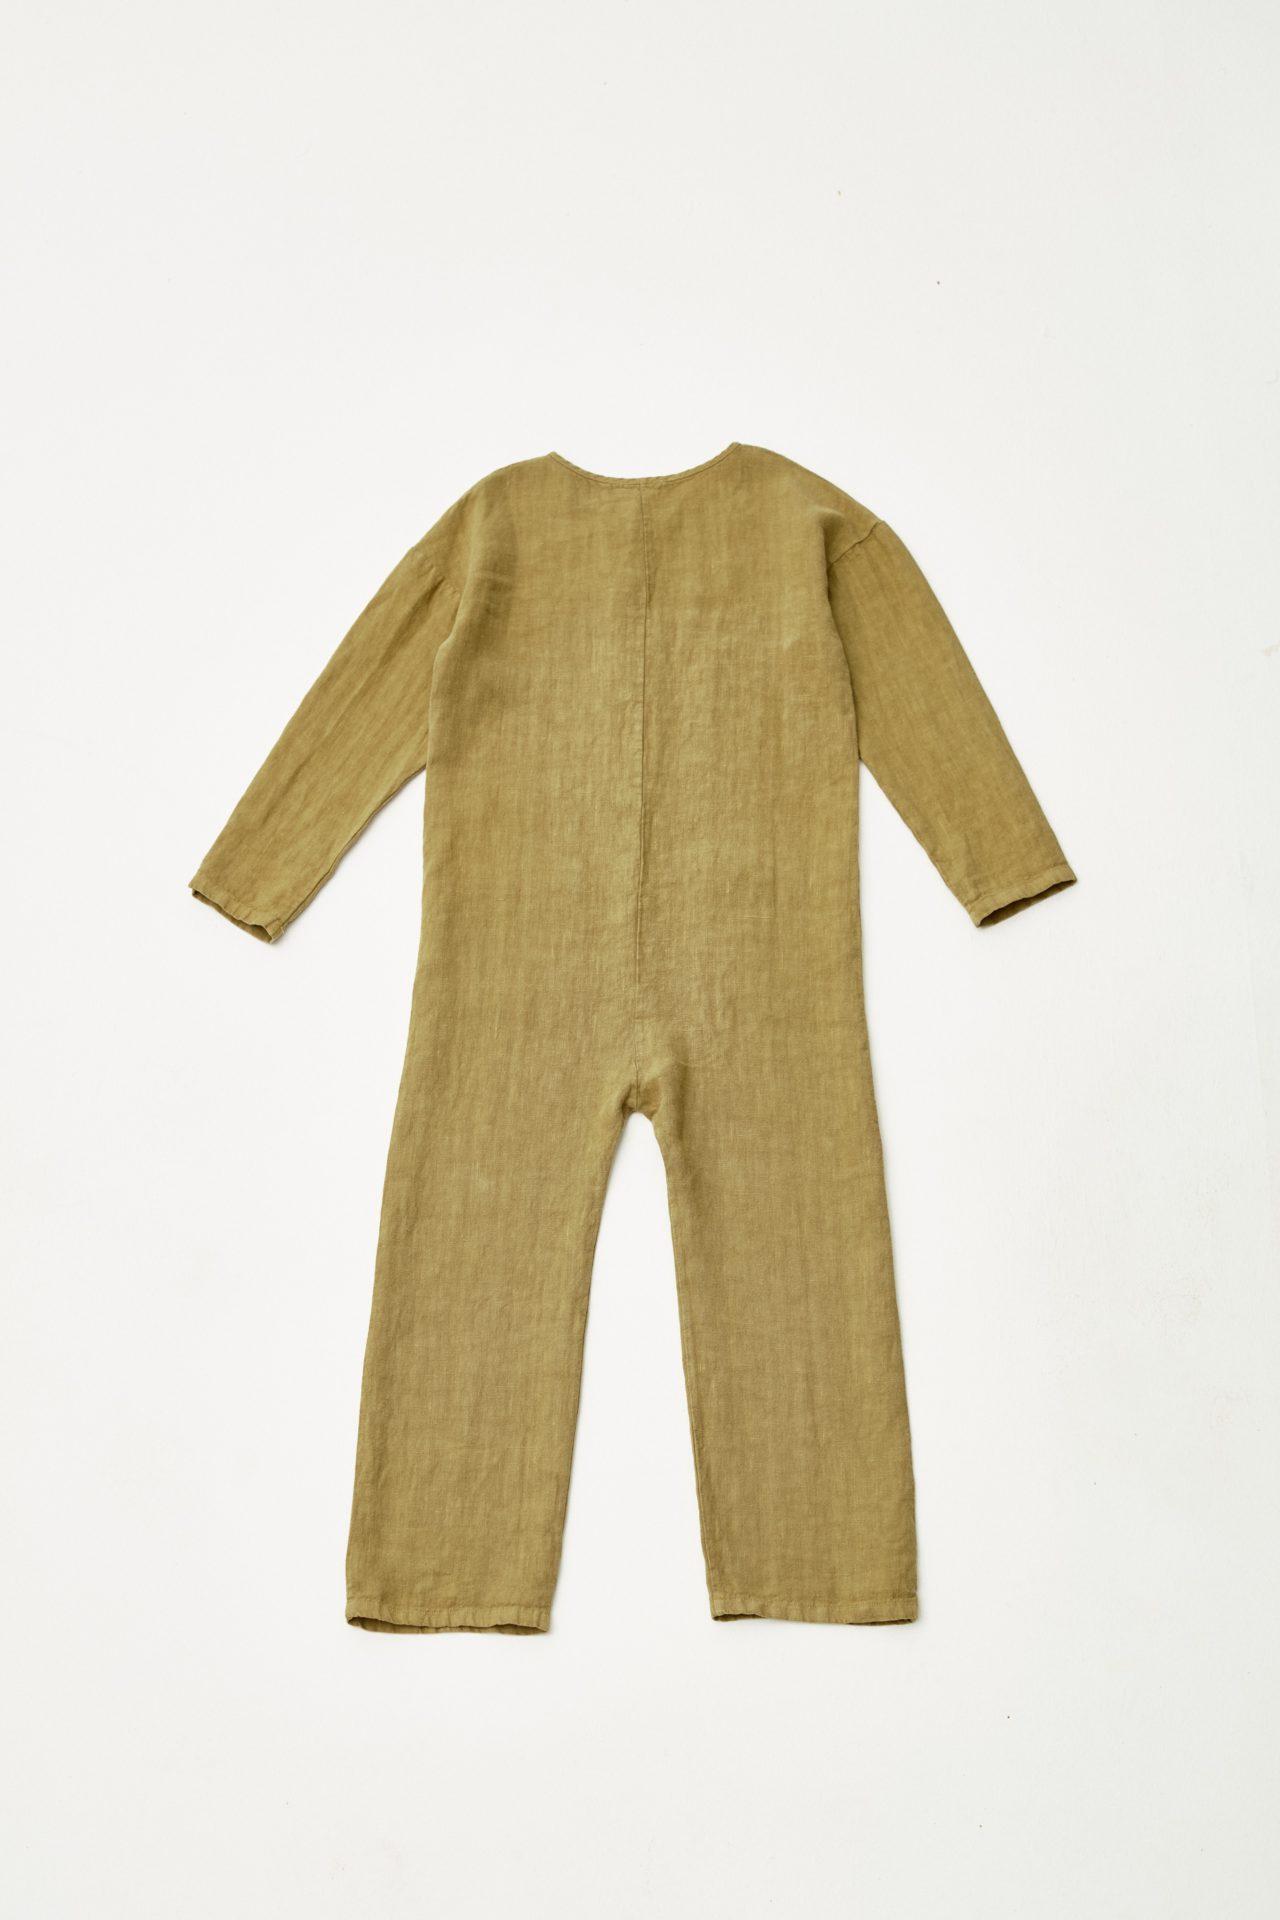 Linen Worker Overall back